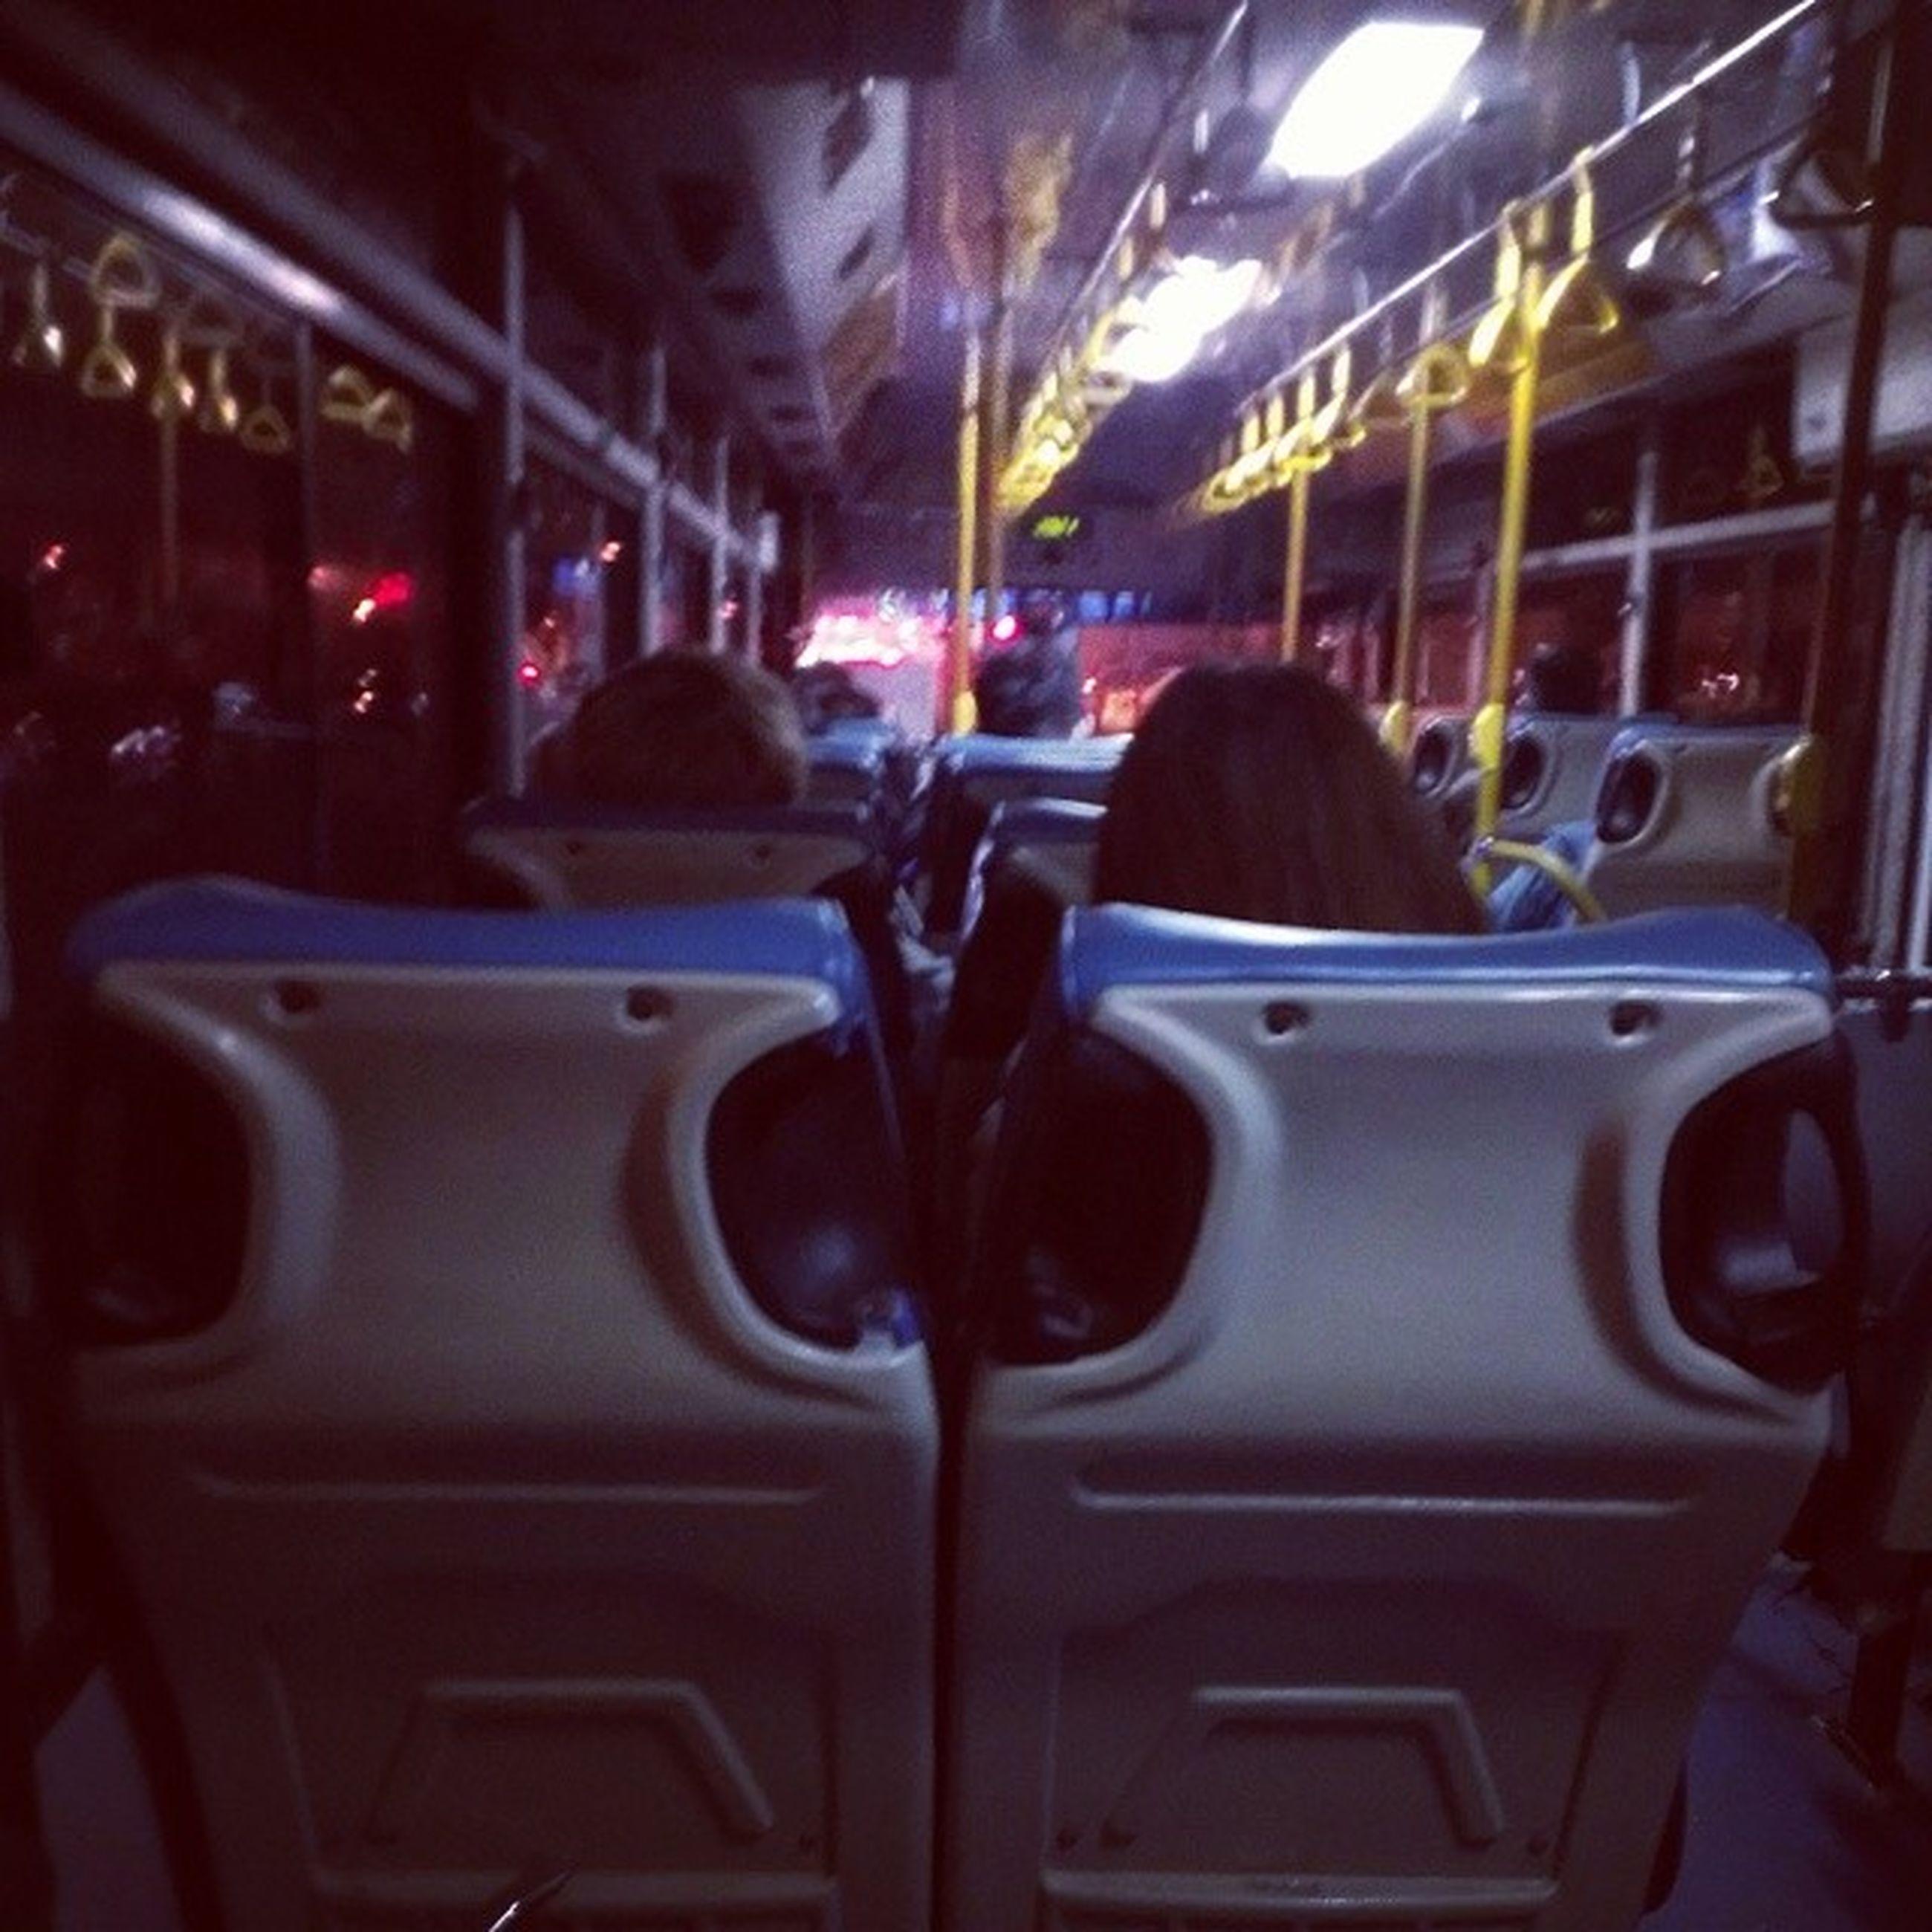 transportation, mode of transport, land vehicle, car, street, men, illuminated, bus, travel, city life, person, city, night, lifestyles, rear view, incidental people, public transportation, on the move, city street